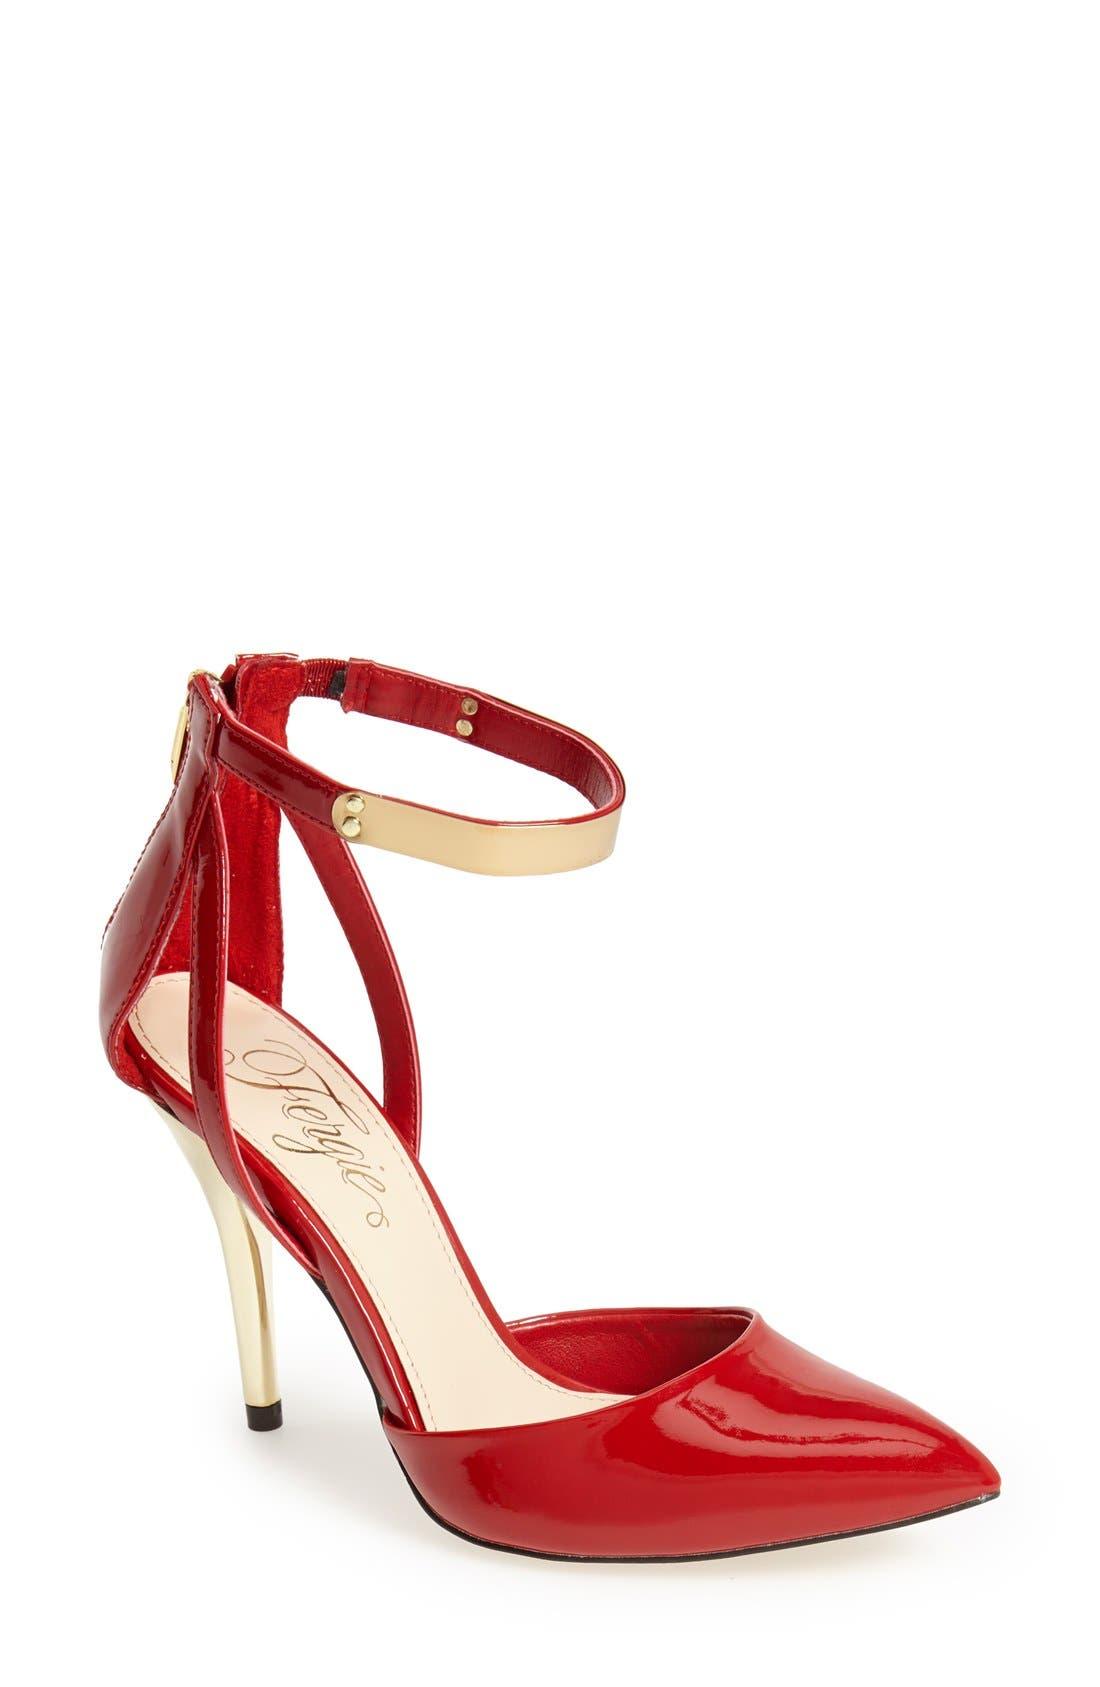 Main Image - Fergie 'Jazz' Ankle Strap d'Orsay Pump (Women)